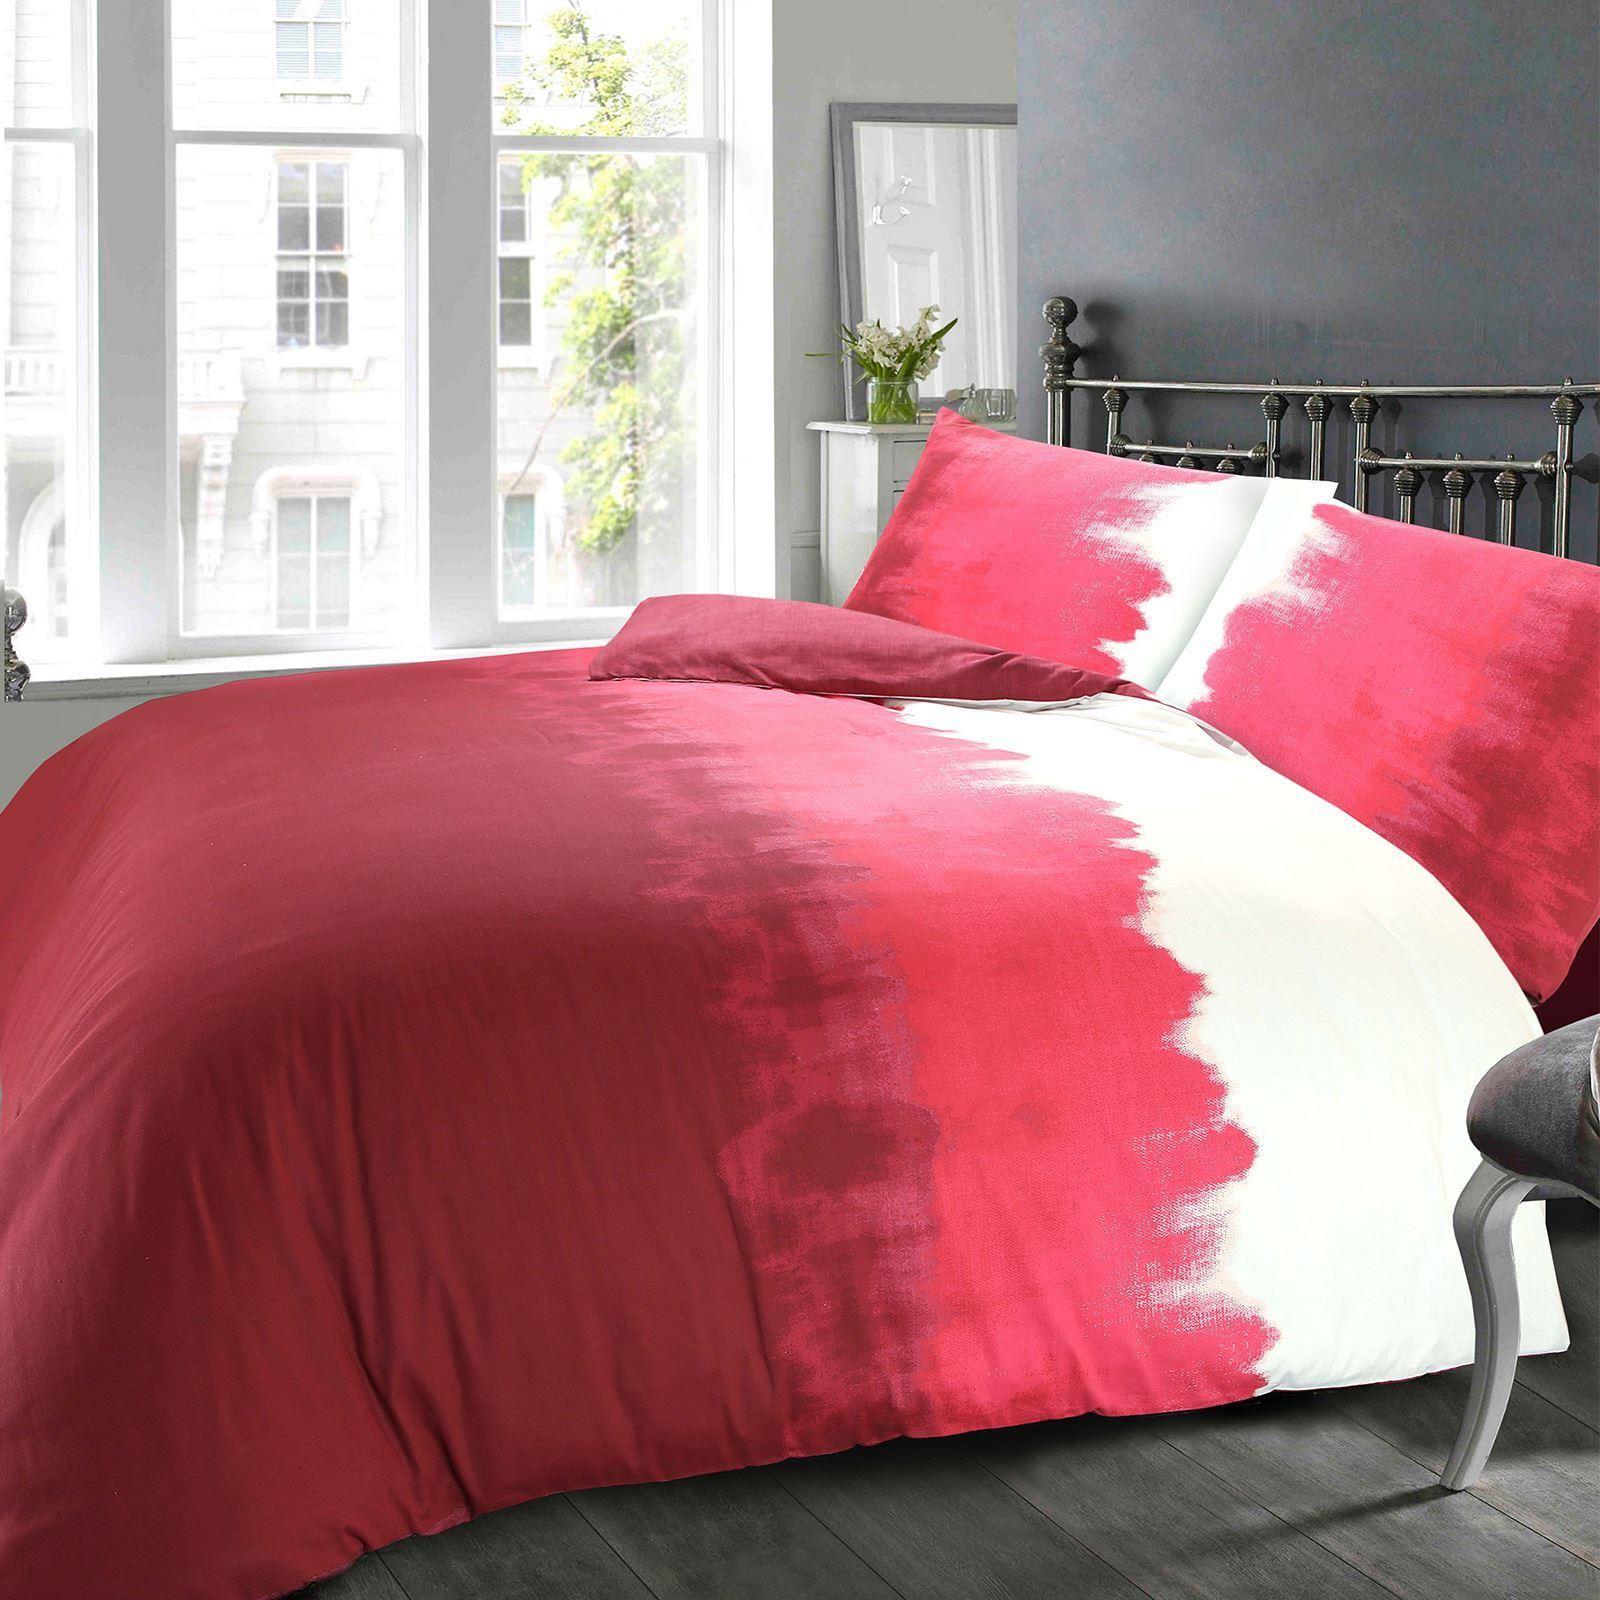 comforters red pinterest florentine floral pin quilt bedding